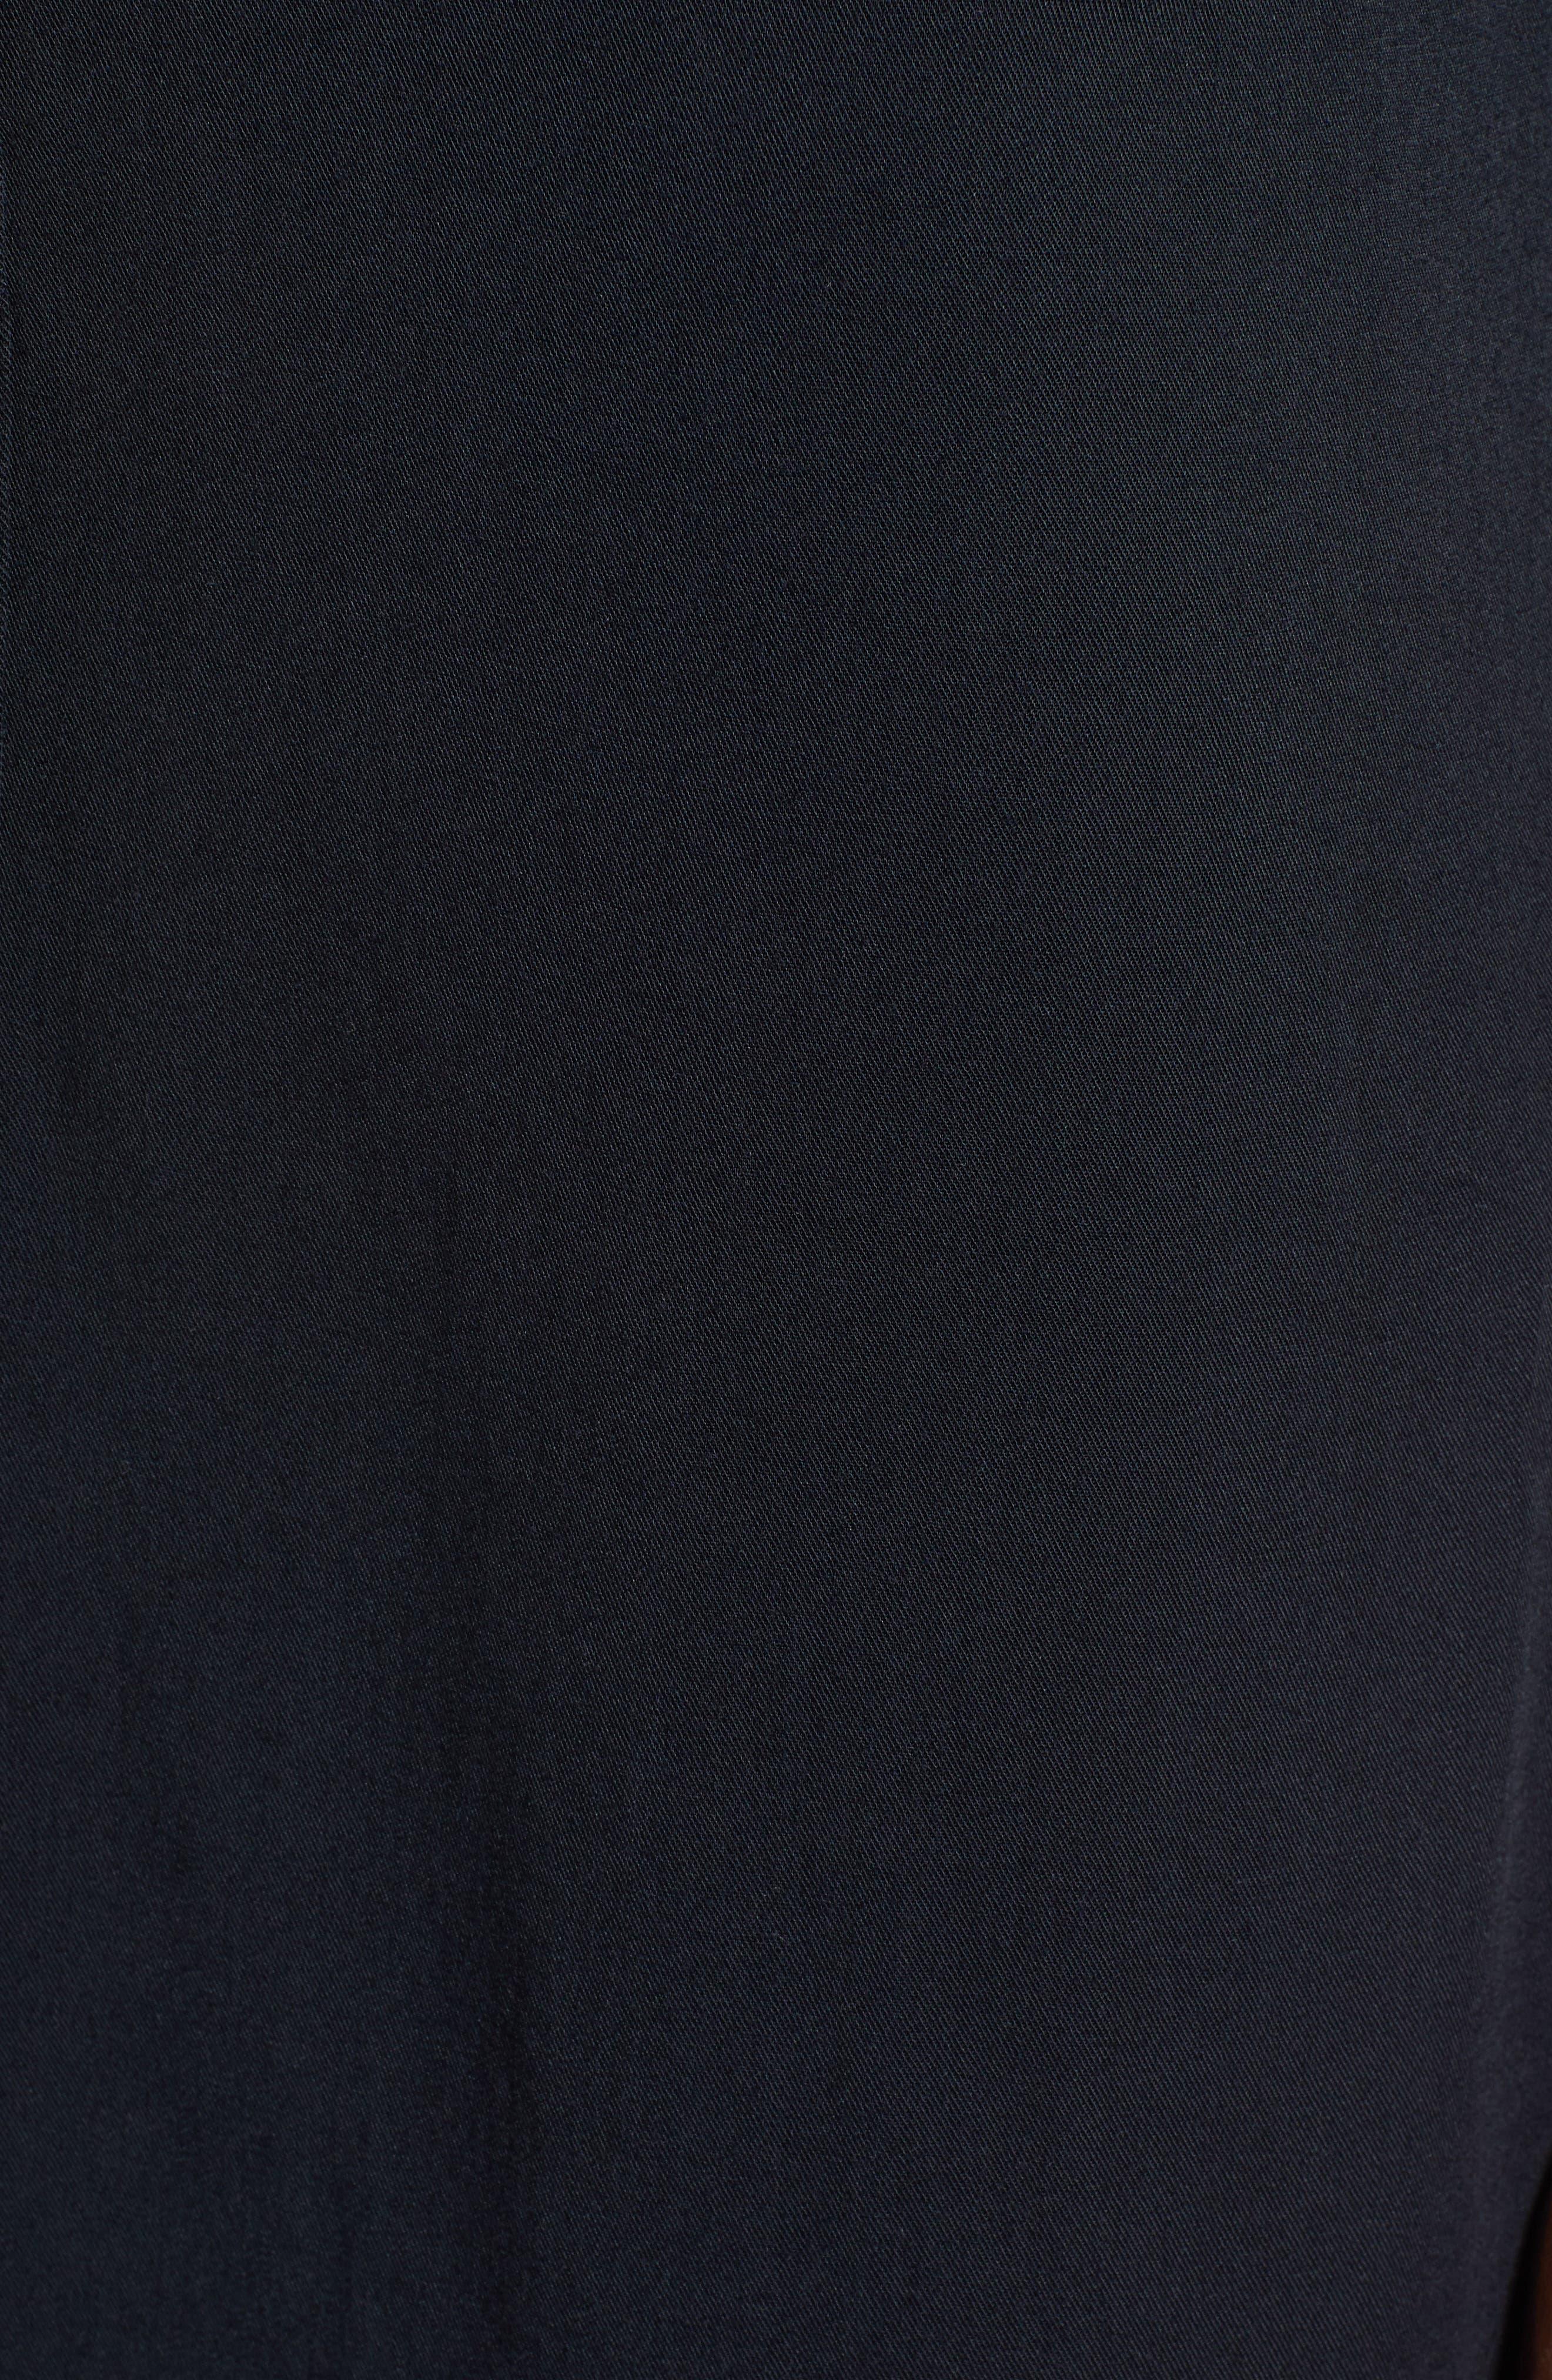 Tomini Bay View Shirtdress,                             Alternate thumbnail 6, color,                             TRUE BLACK